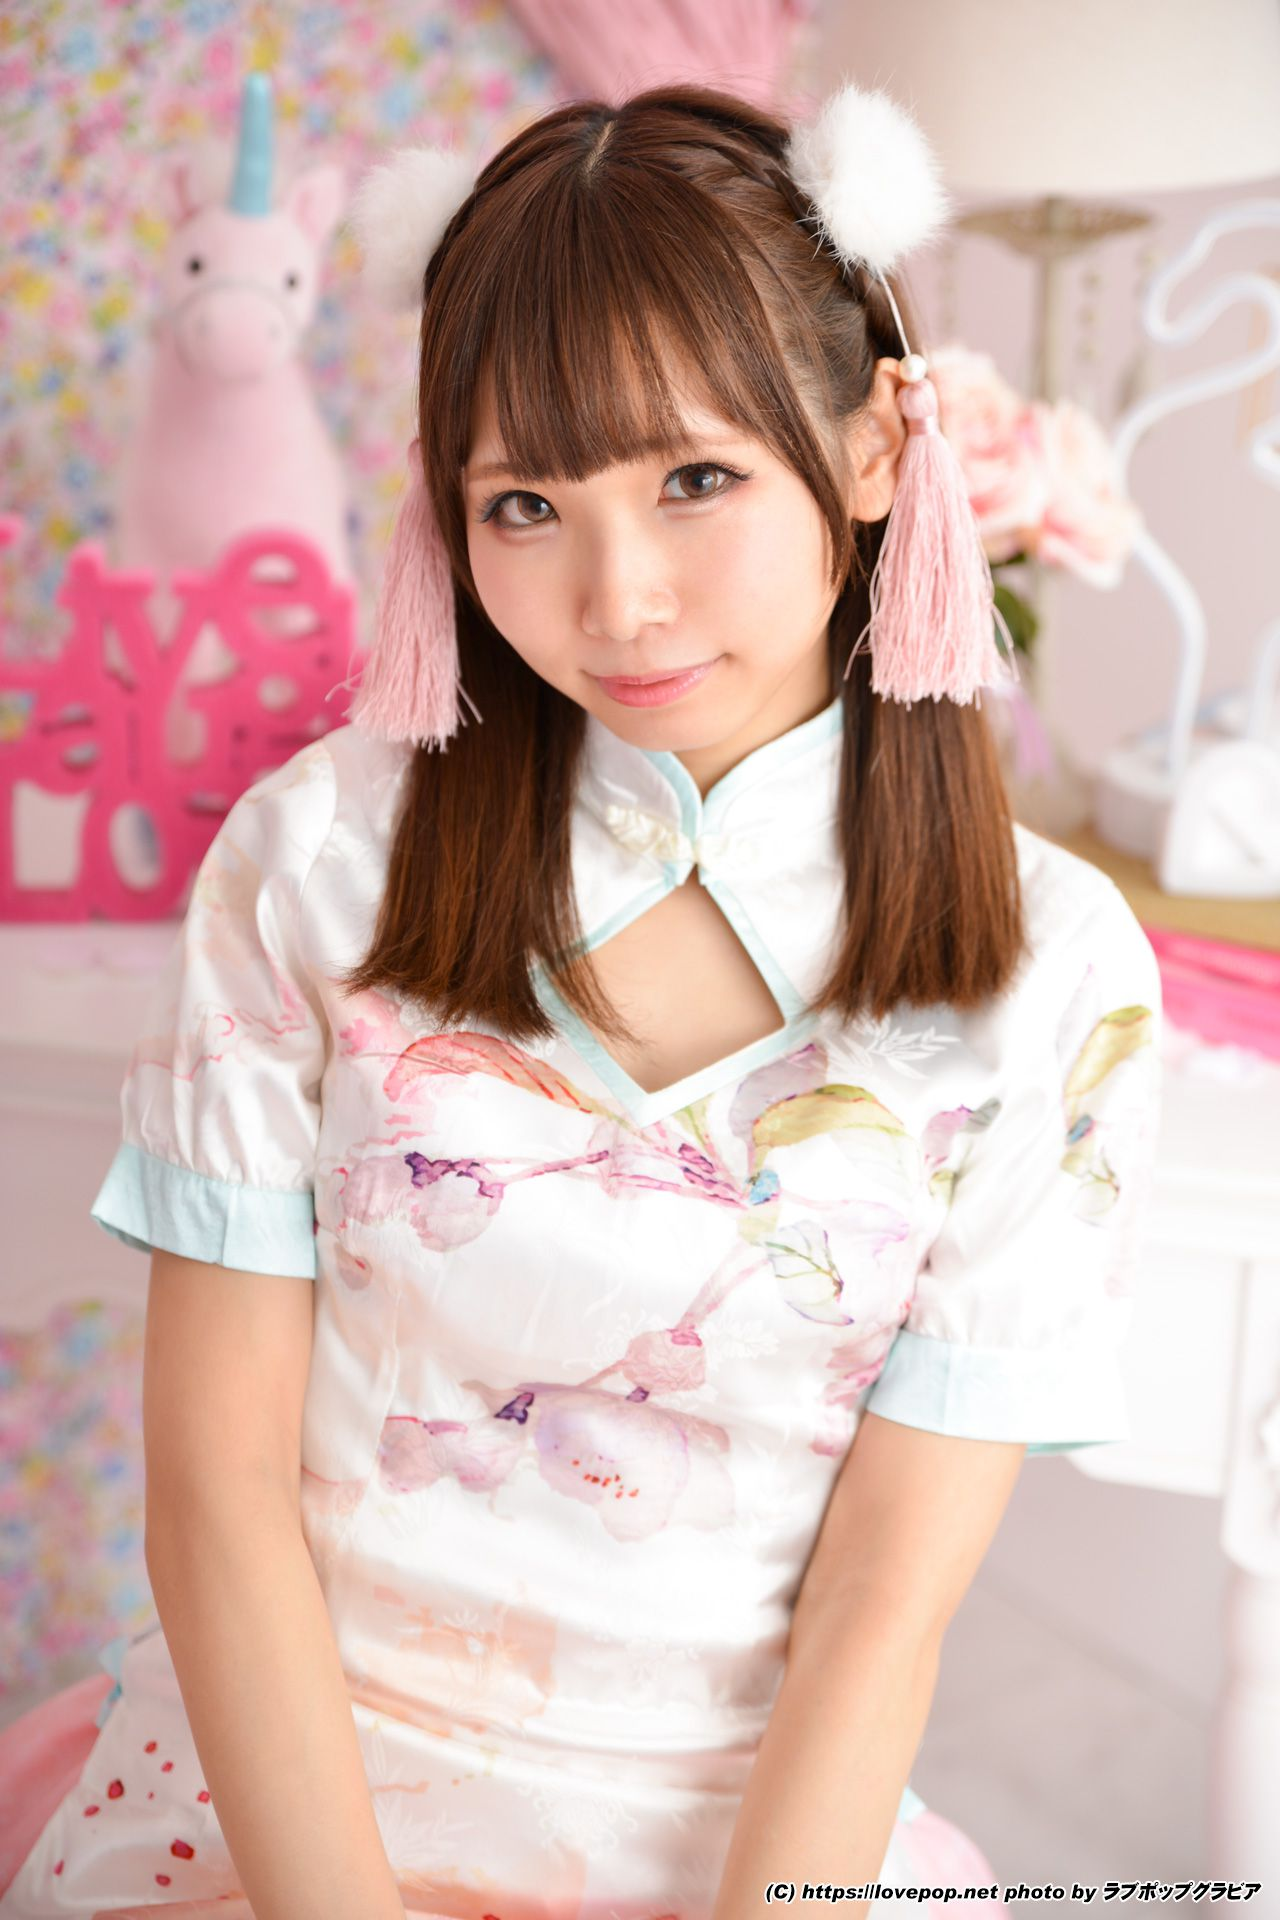 [LOVEPOP] 姫宫まほれ Mahore Himemiya Photoset 04 写真集[70P]插图(2)